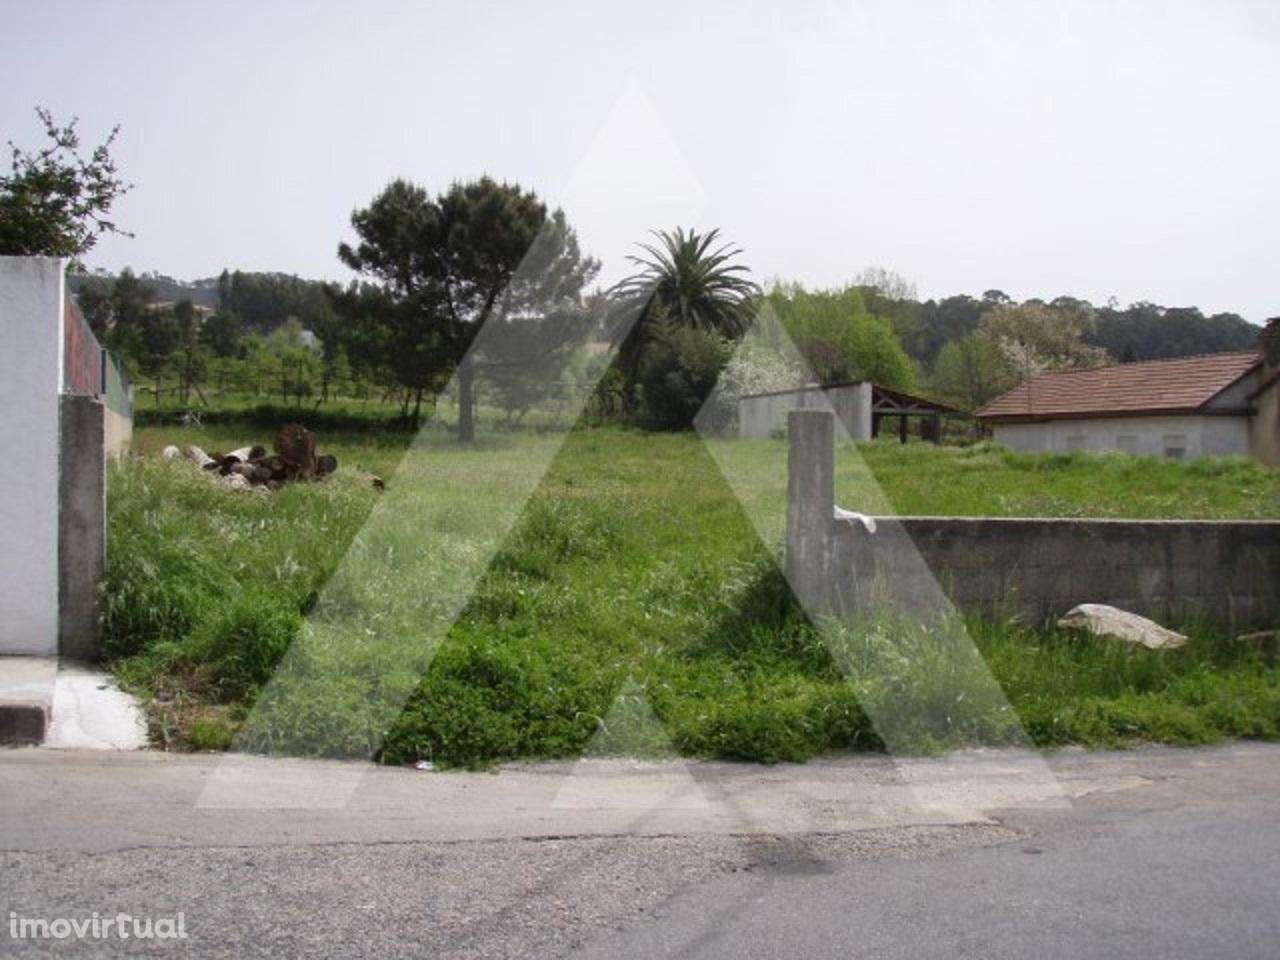 Terreno para comprar, Milheirós de Poiares, Aveiro - Foto 3